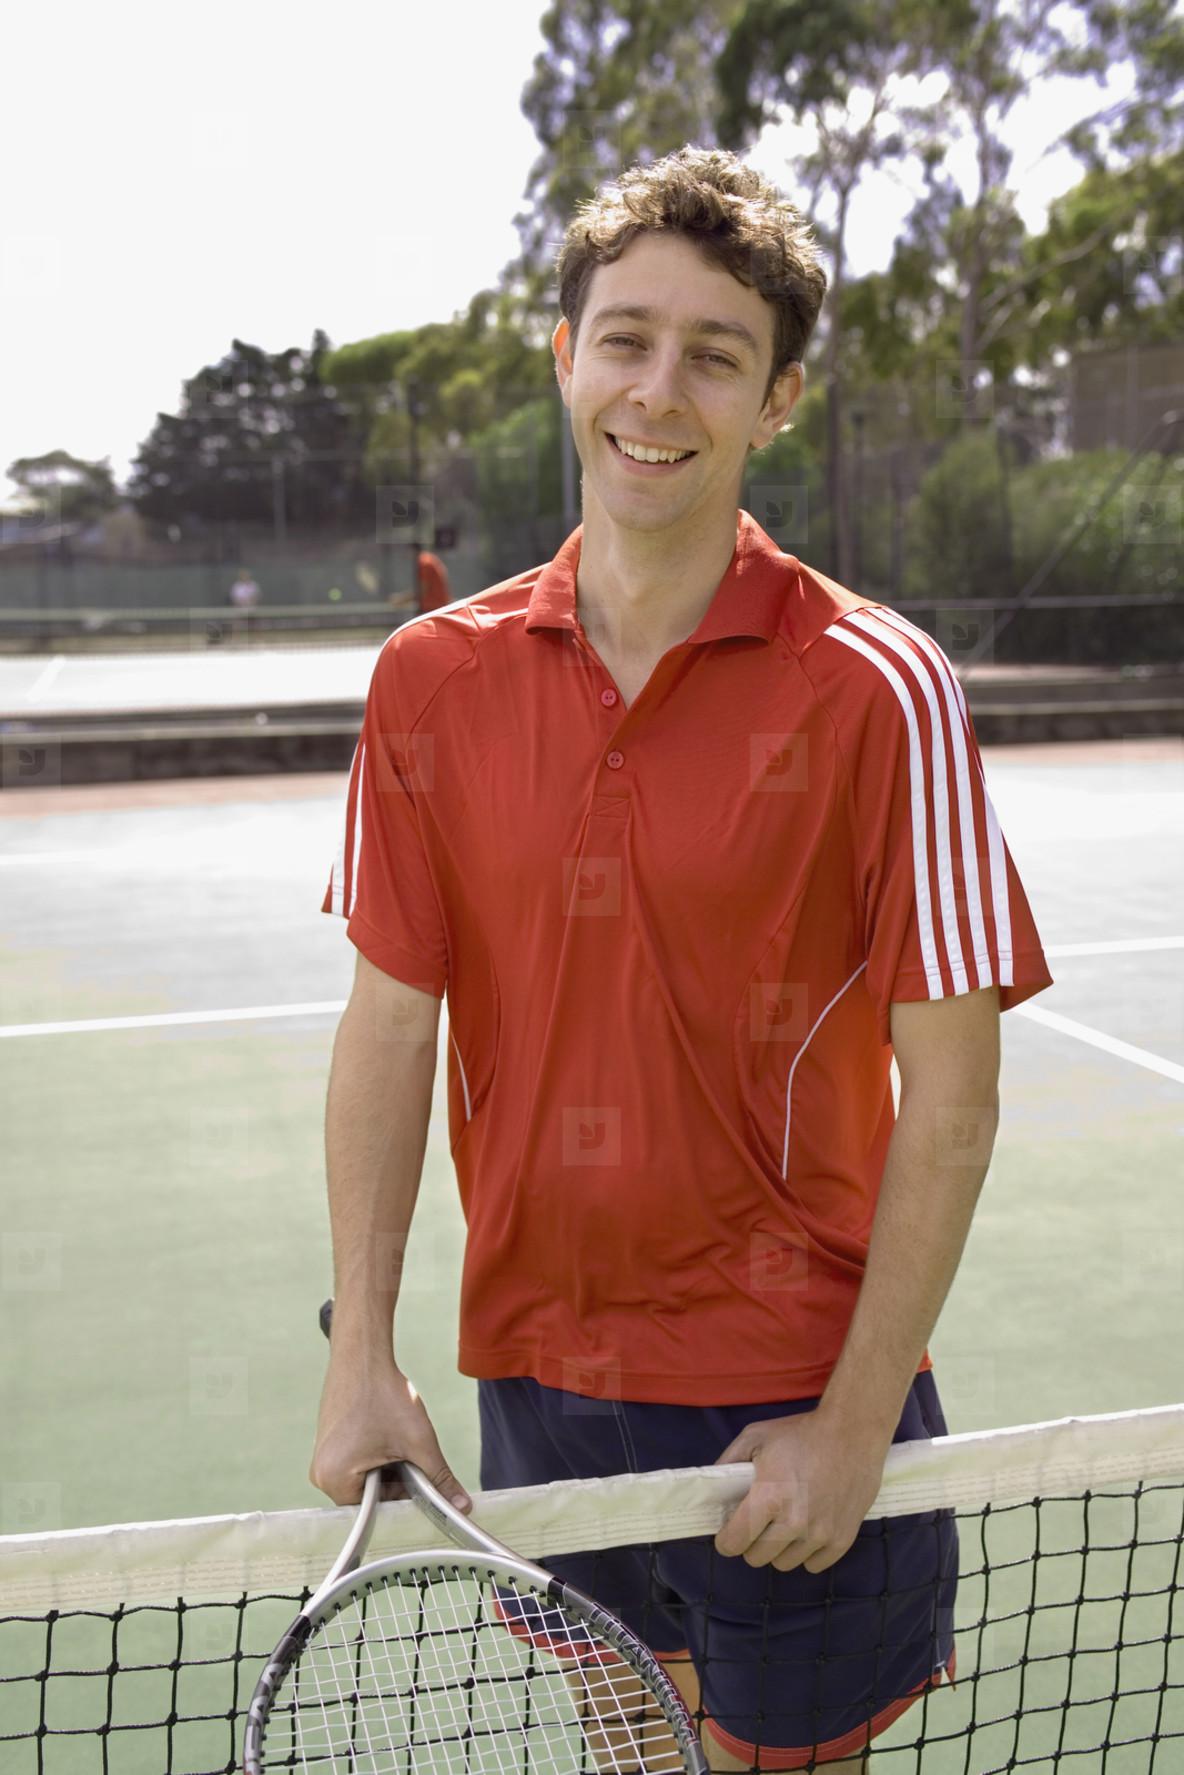 Serious Tennis  57